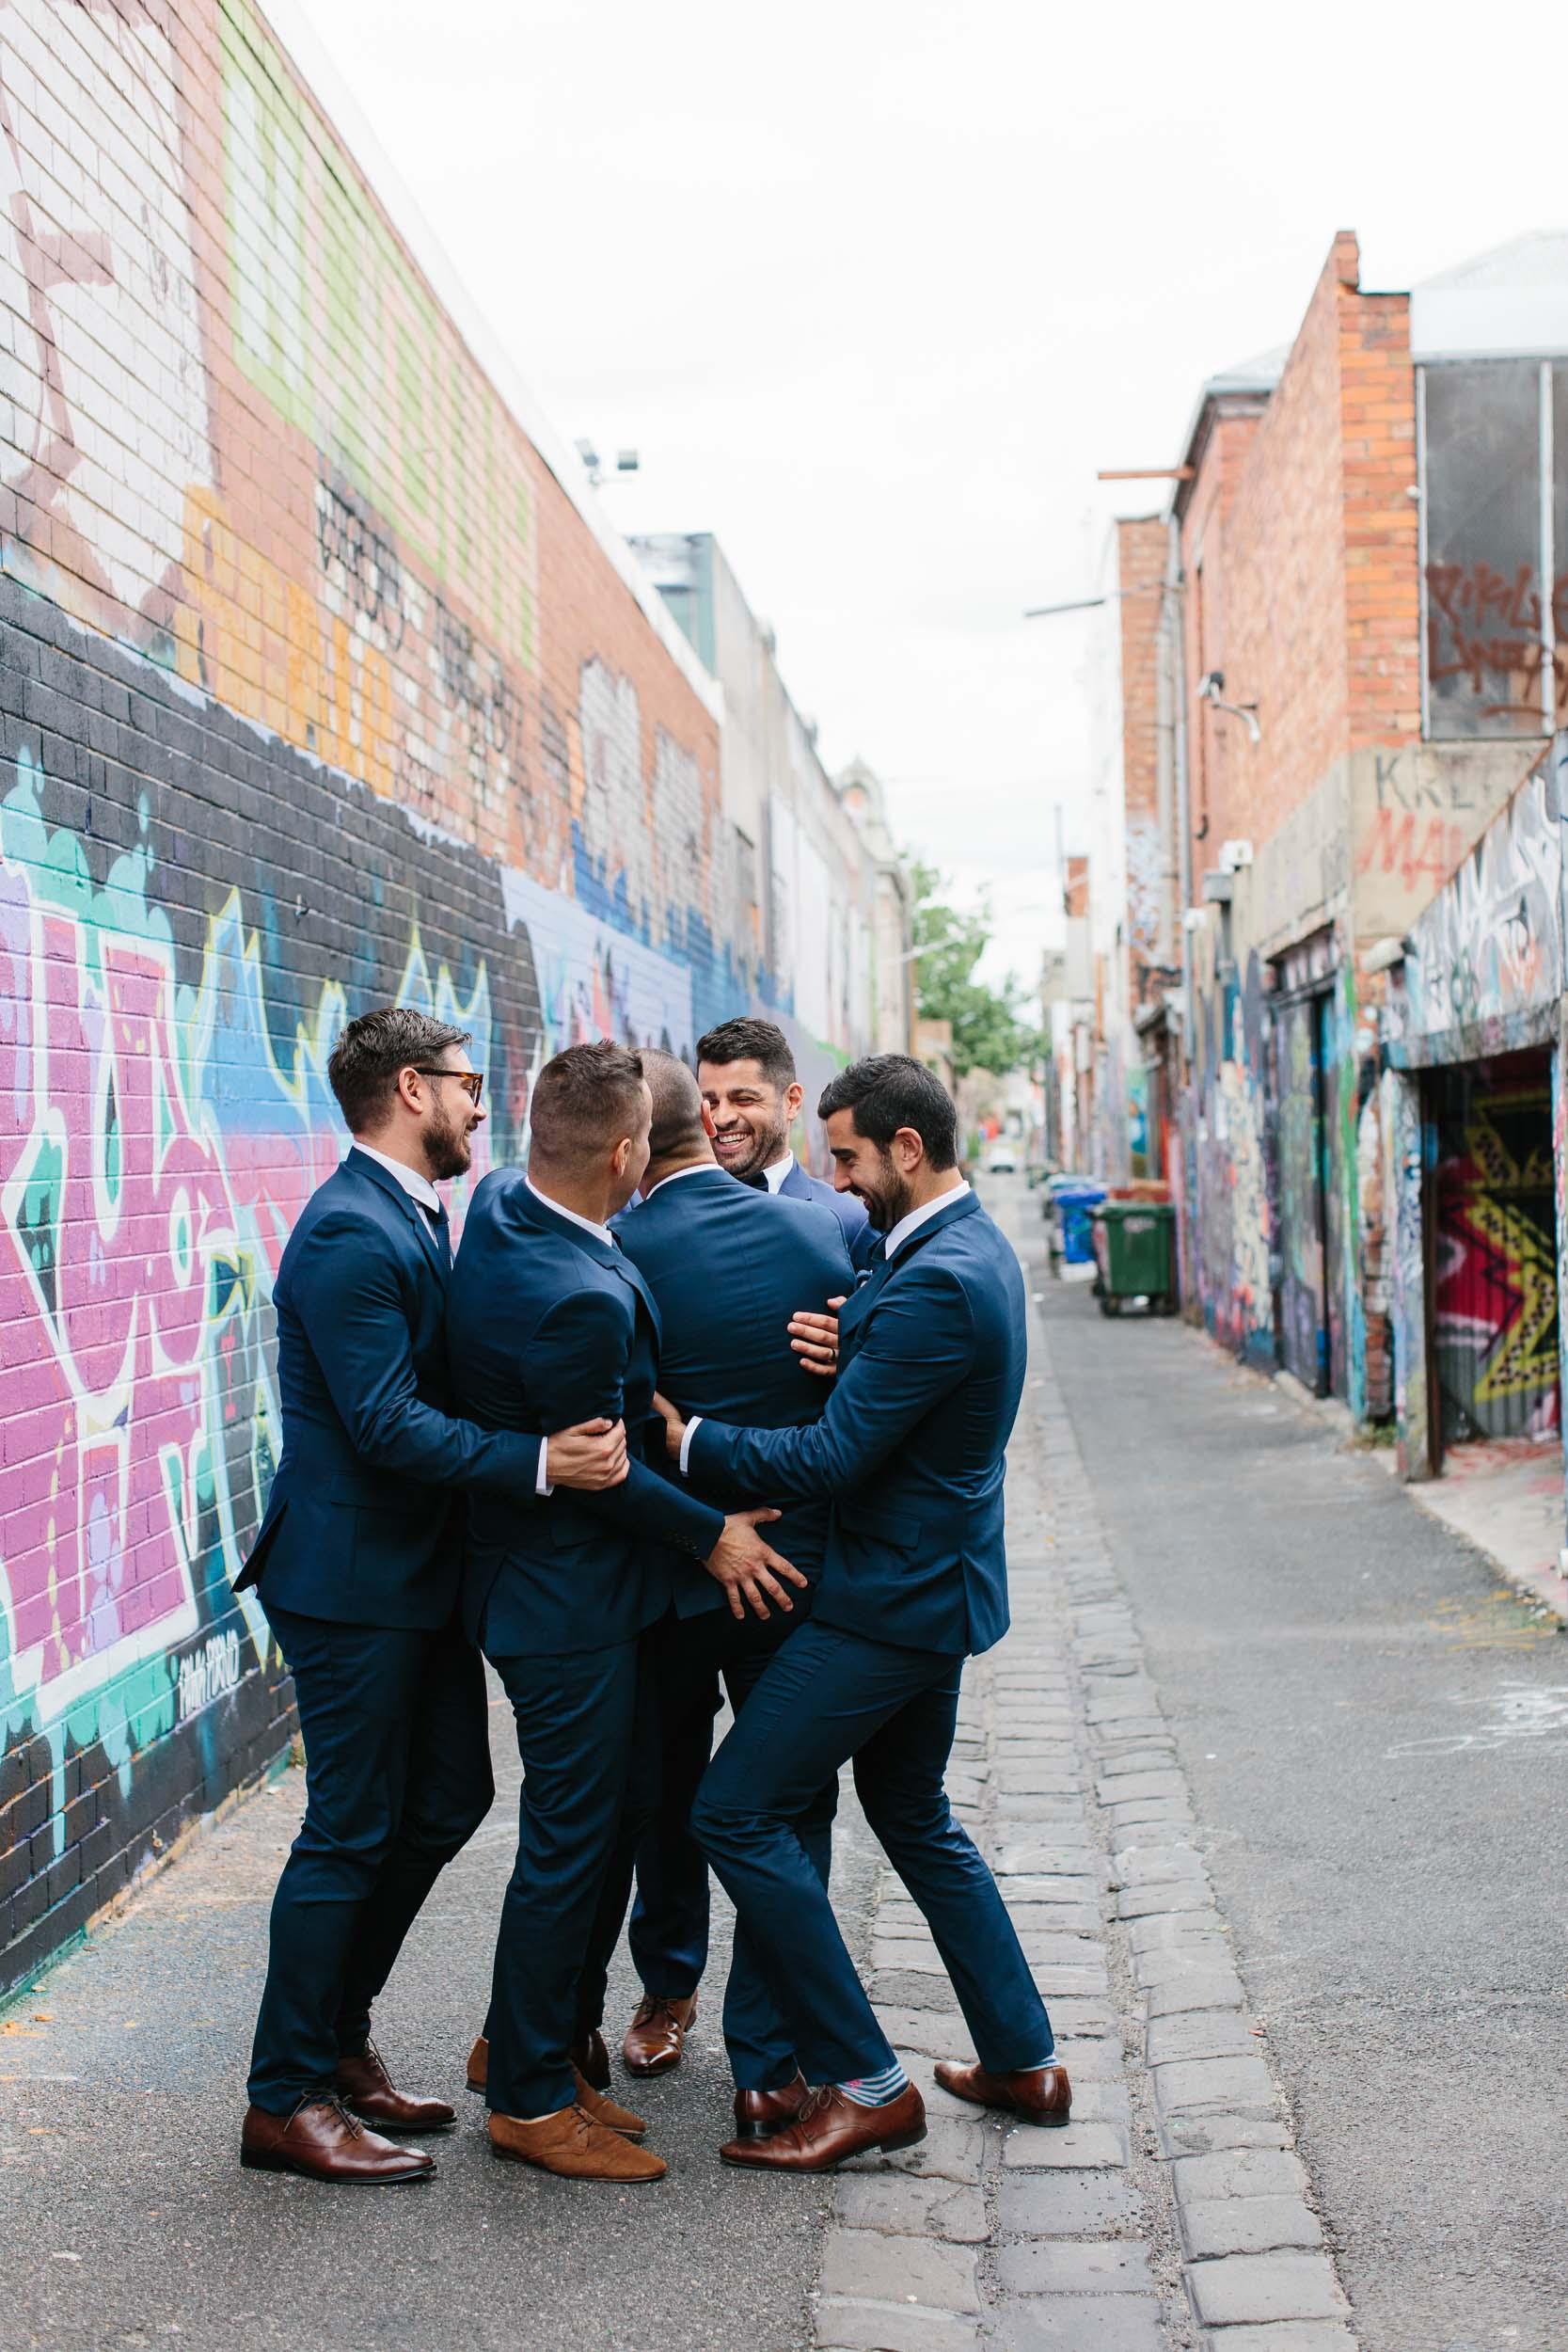 Kas-Richards-Urban-Melbourne-Wedding-Jason-Grech-456.jpg